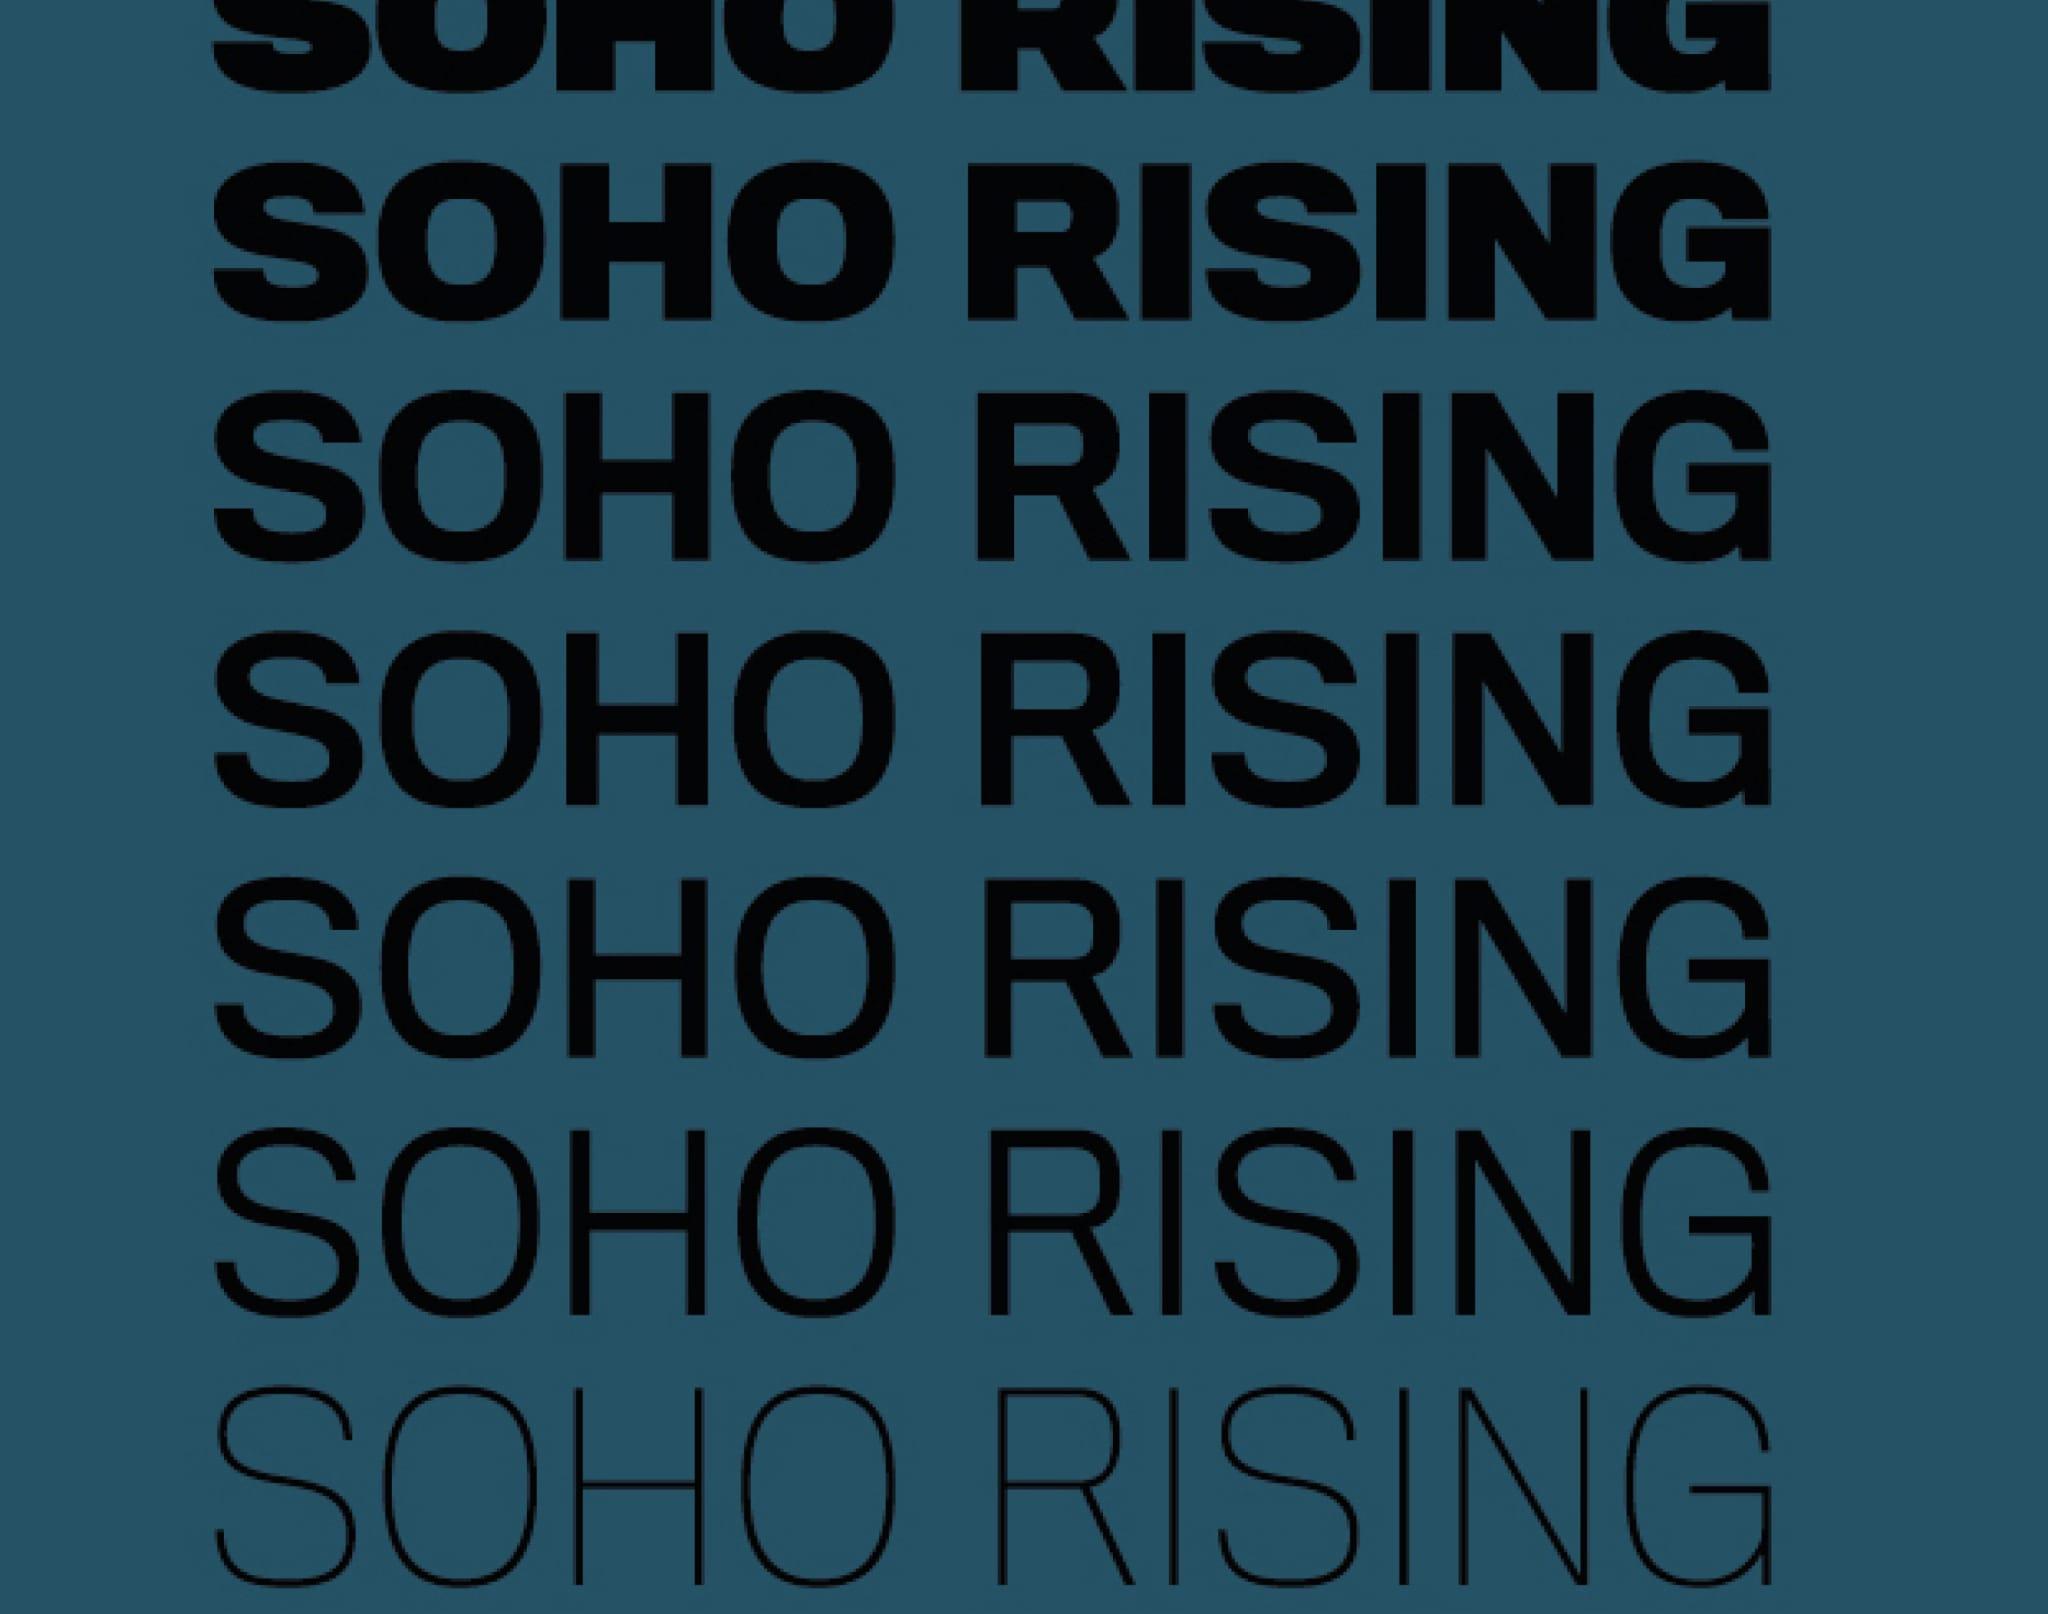 A logo with Soho Rising written 7 times.